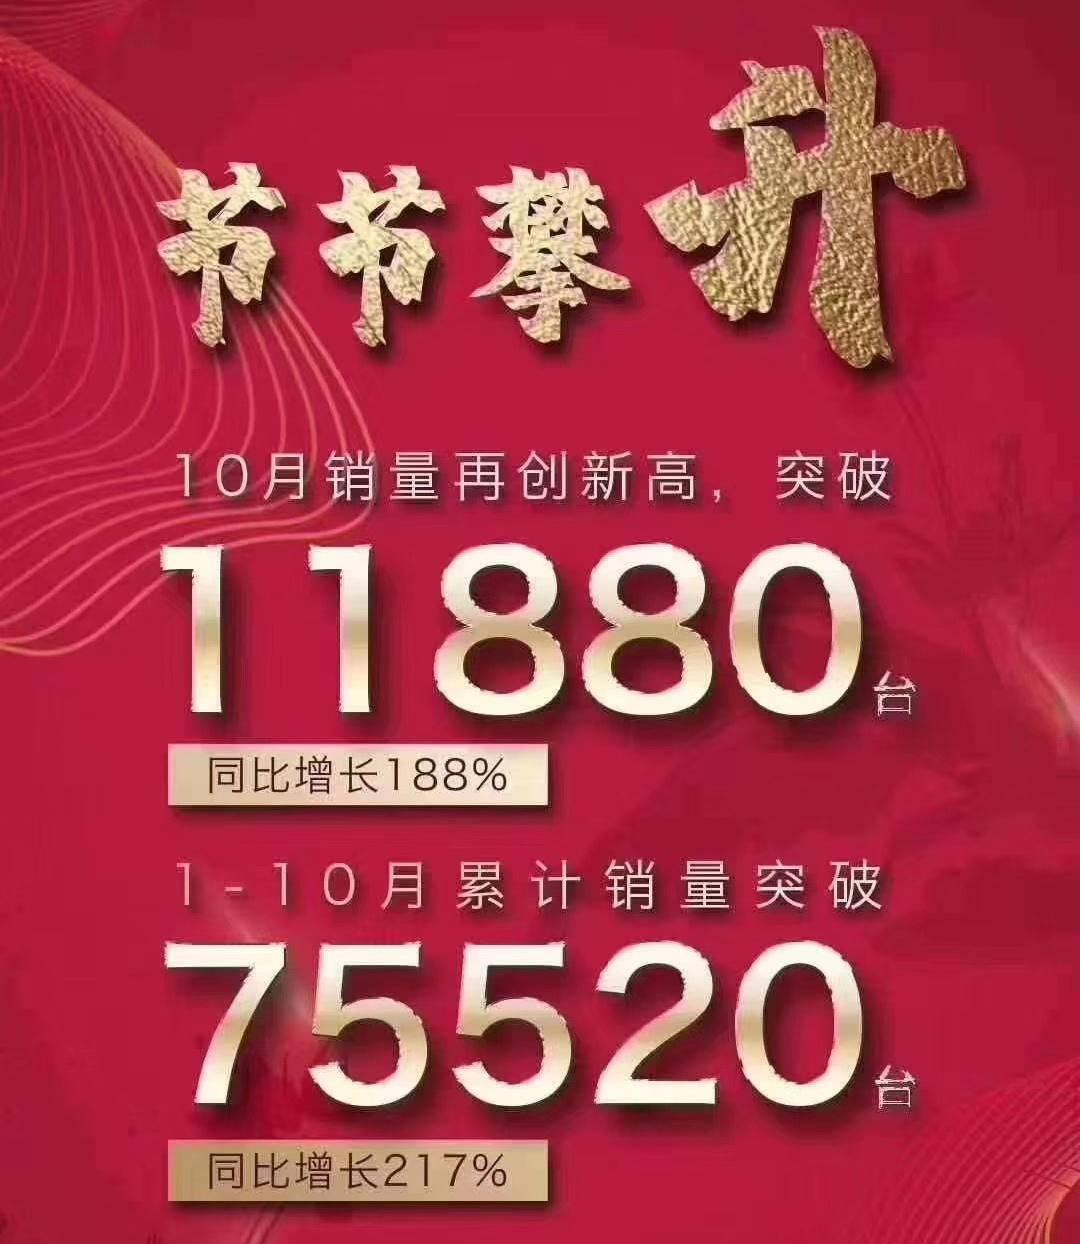 http://cools.qctt.cn/1572610098871.jpeg?imageMogr2/size-limit/1024k!